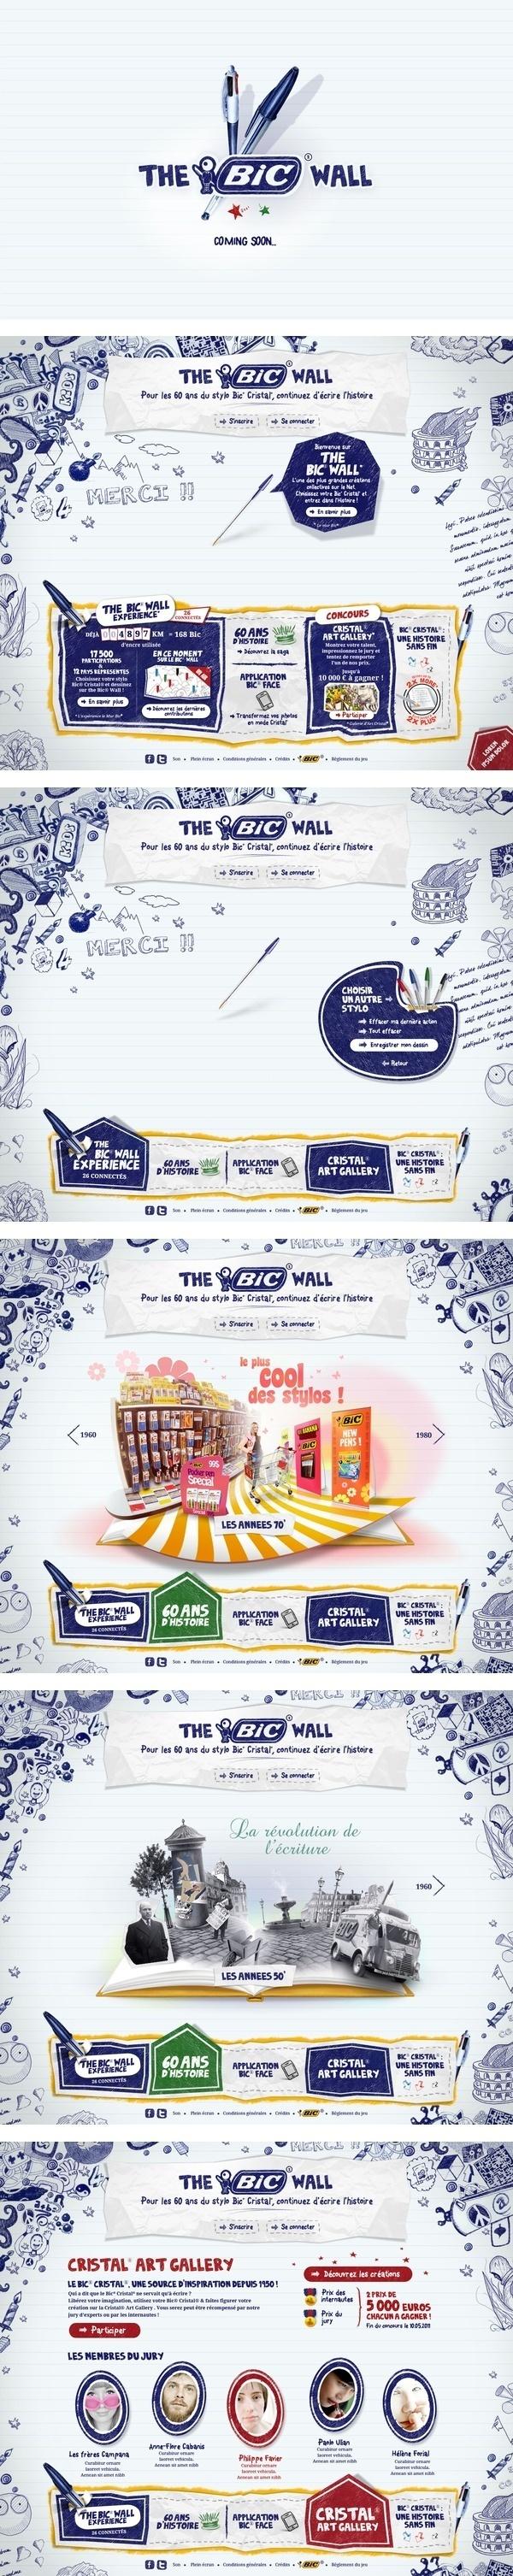 The Bic Wall Branding and Website Design #design #web #branding